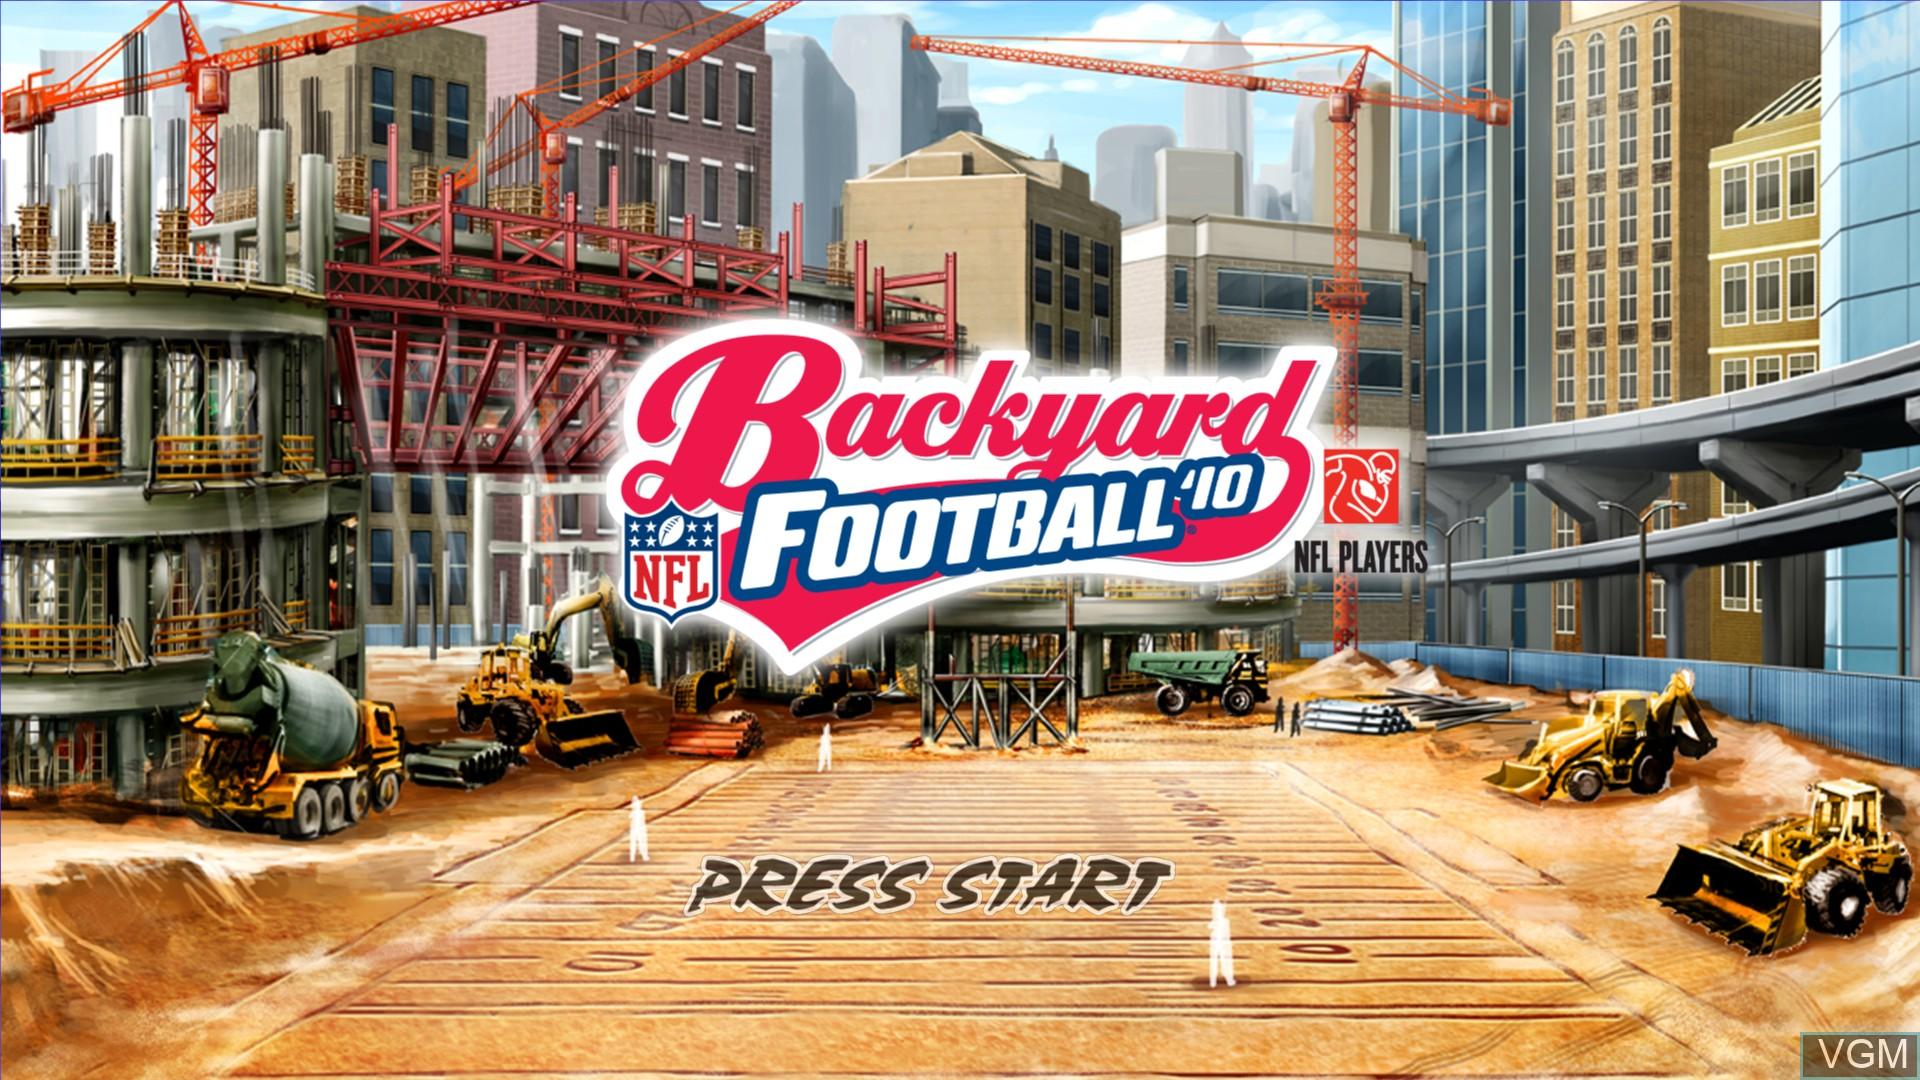 Backyard Football '10 for Microsoft Xbox 360 - The Video ...